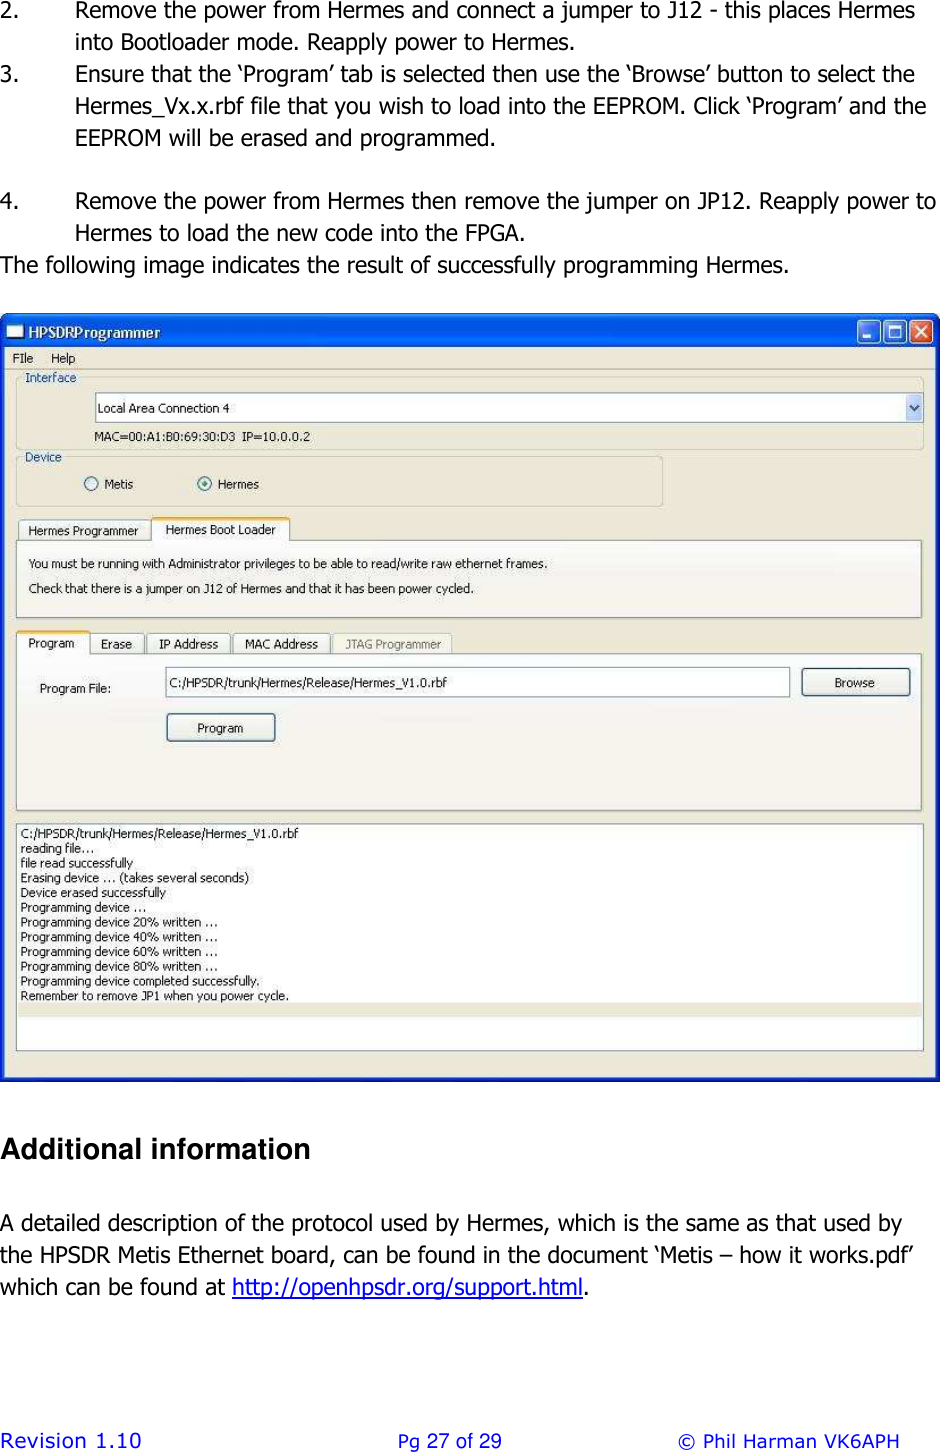 Hermes_User_Manual_V1 10 Hermes User Manual V1 10